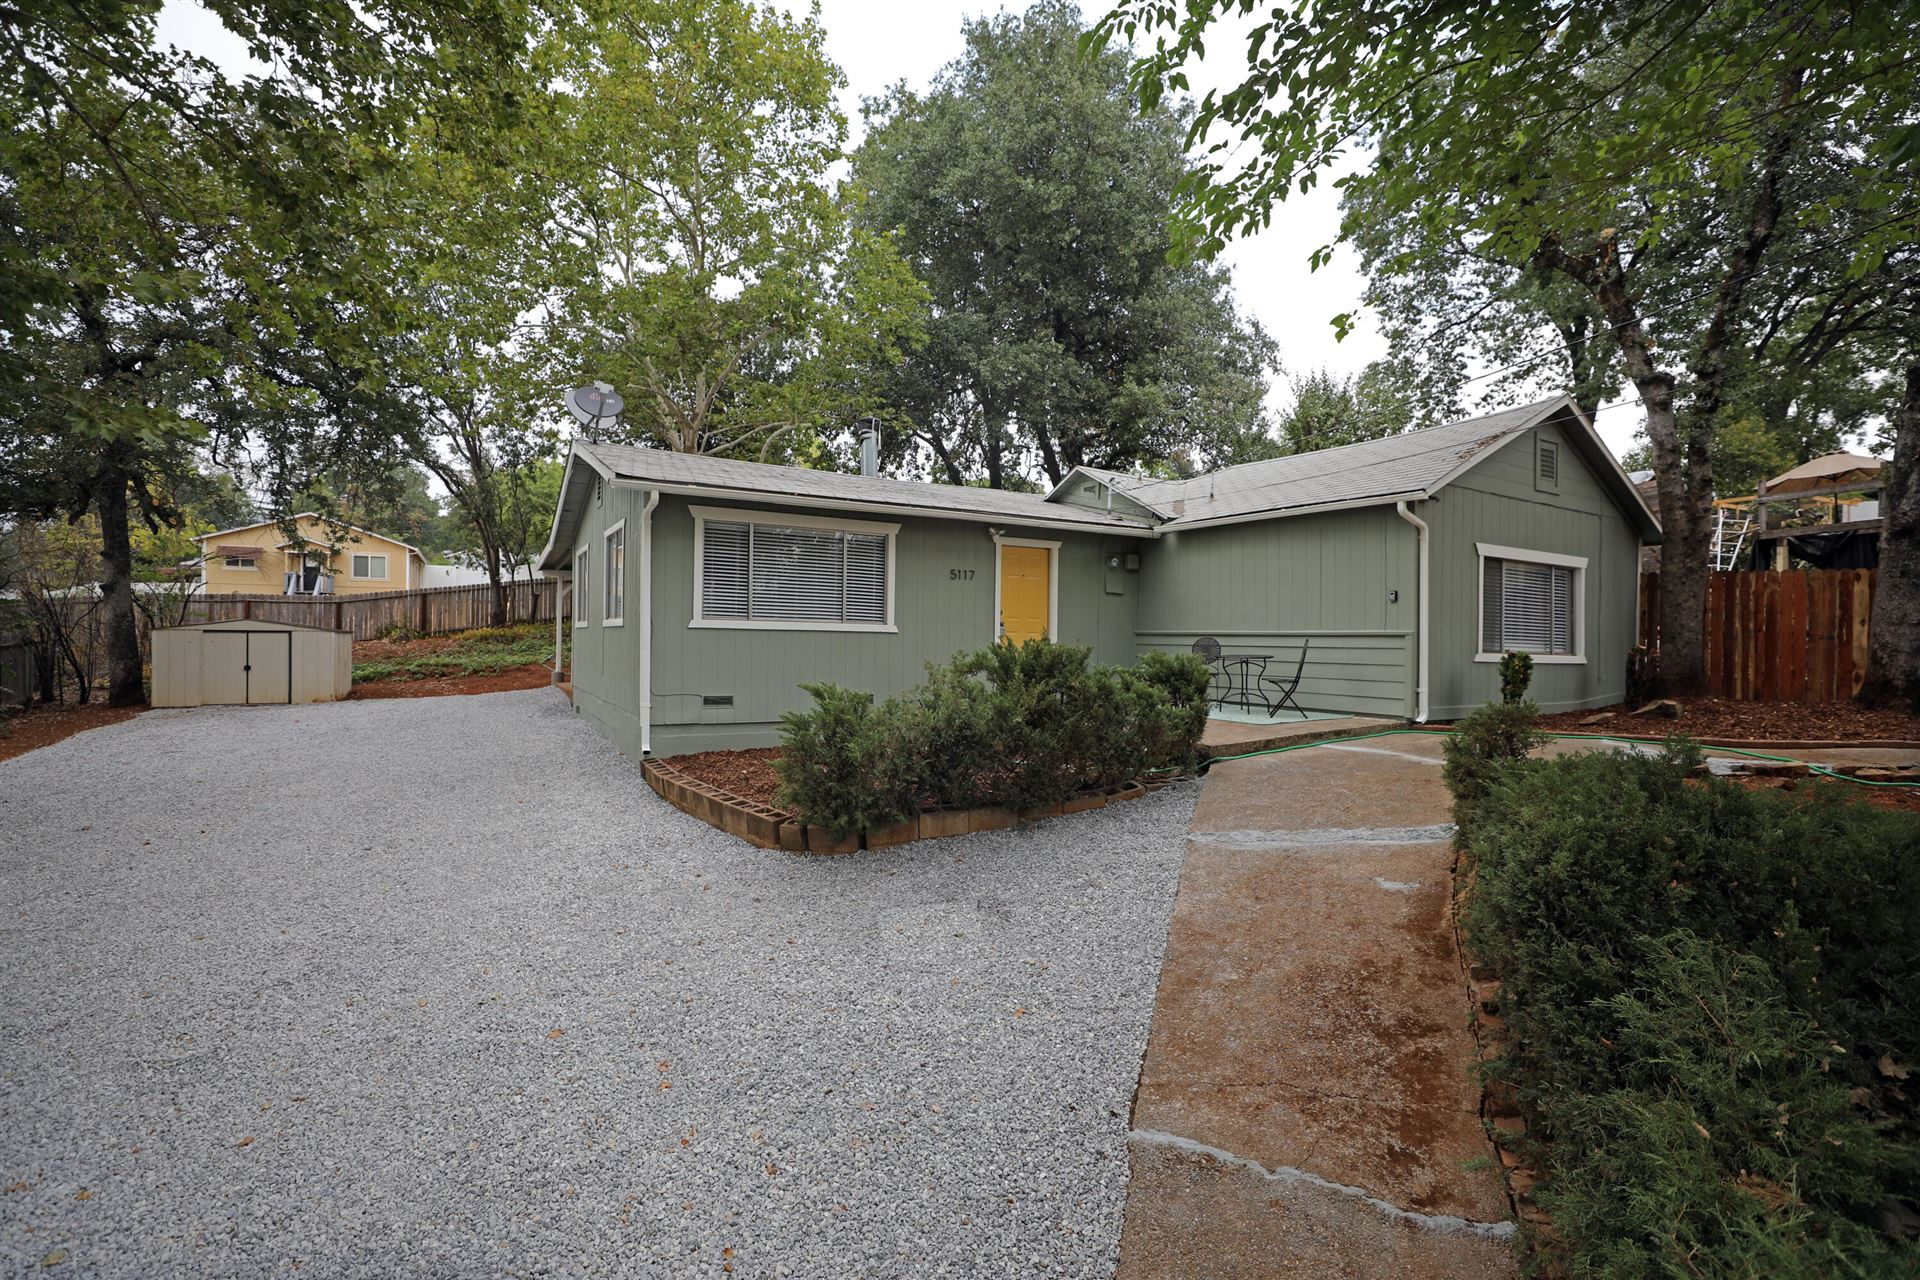 Photo of 5117 Front St, Shasta Lake, CA 96019 (MLS # 21-4331)